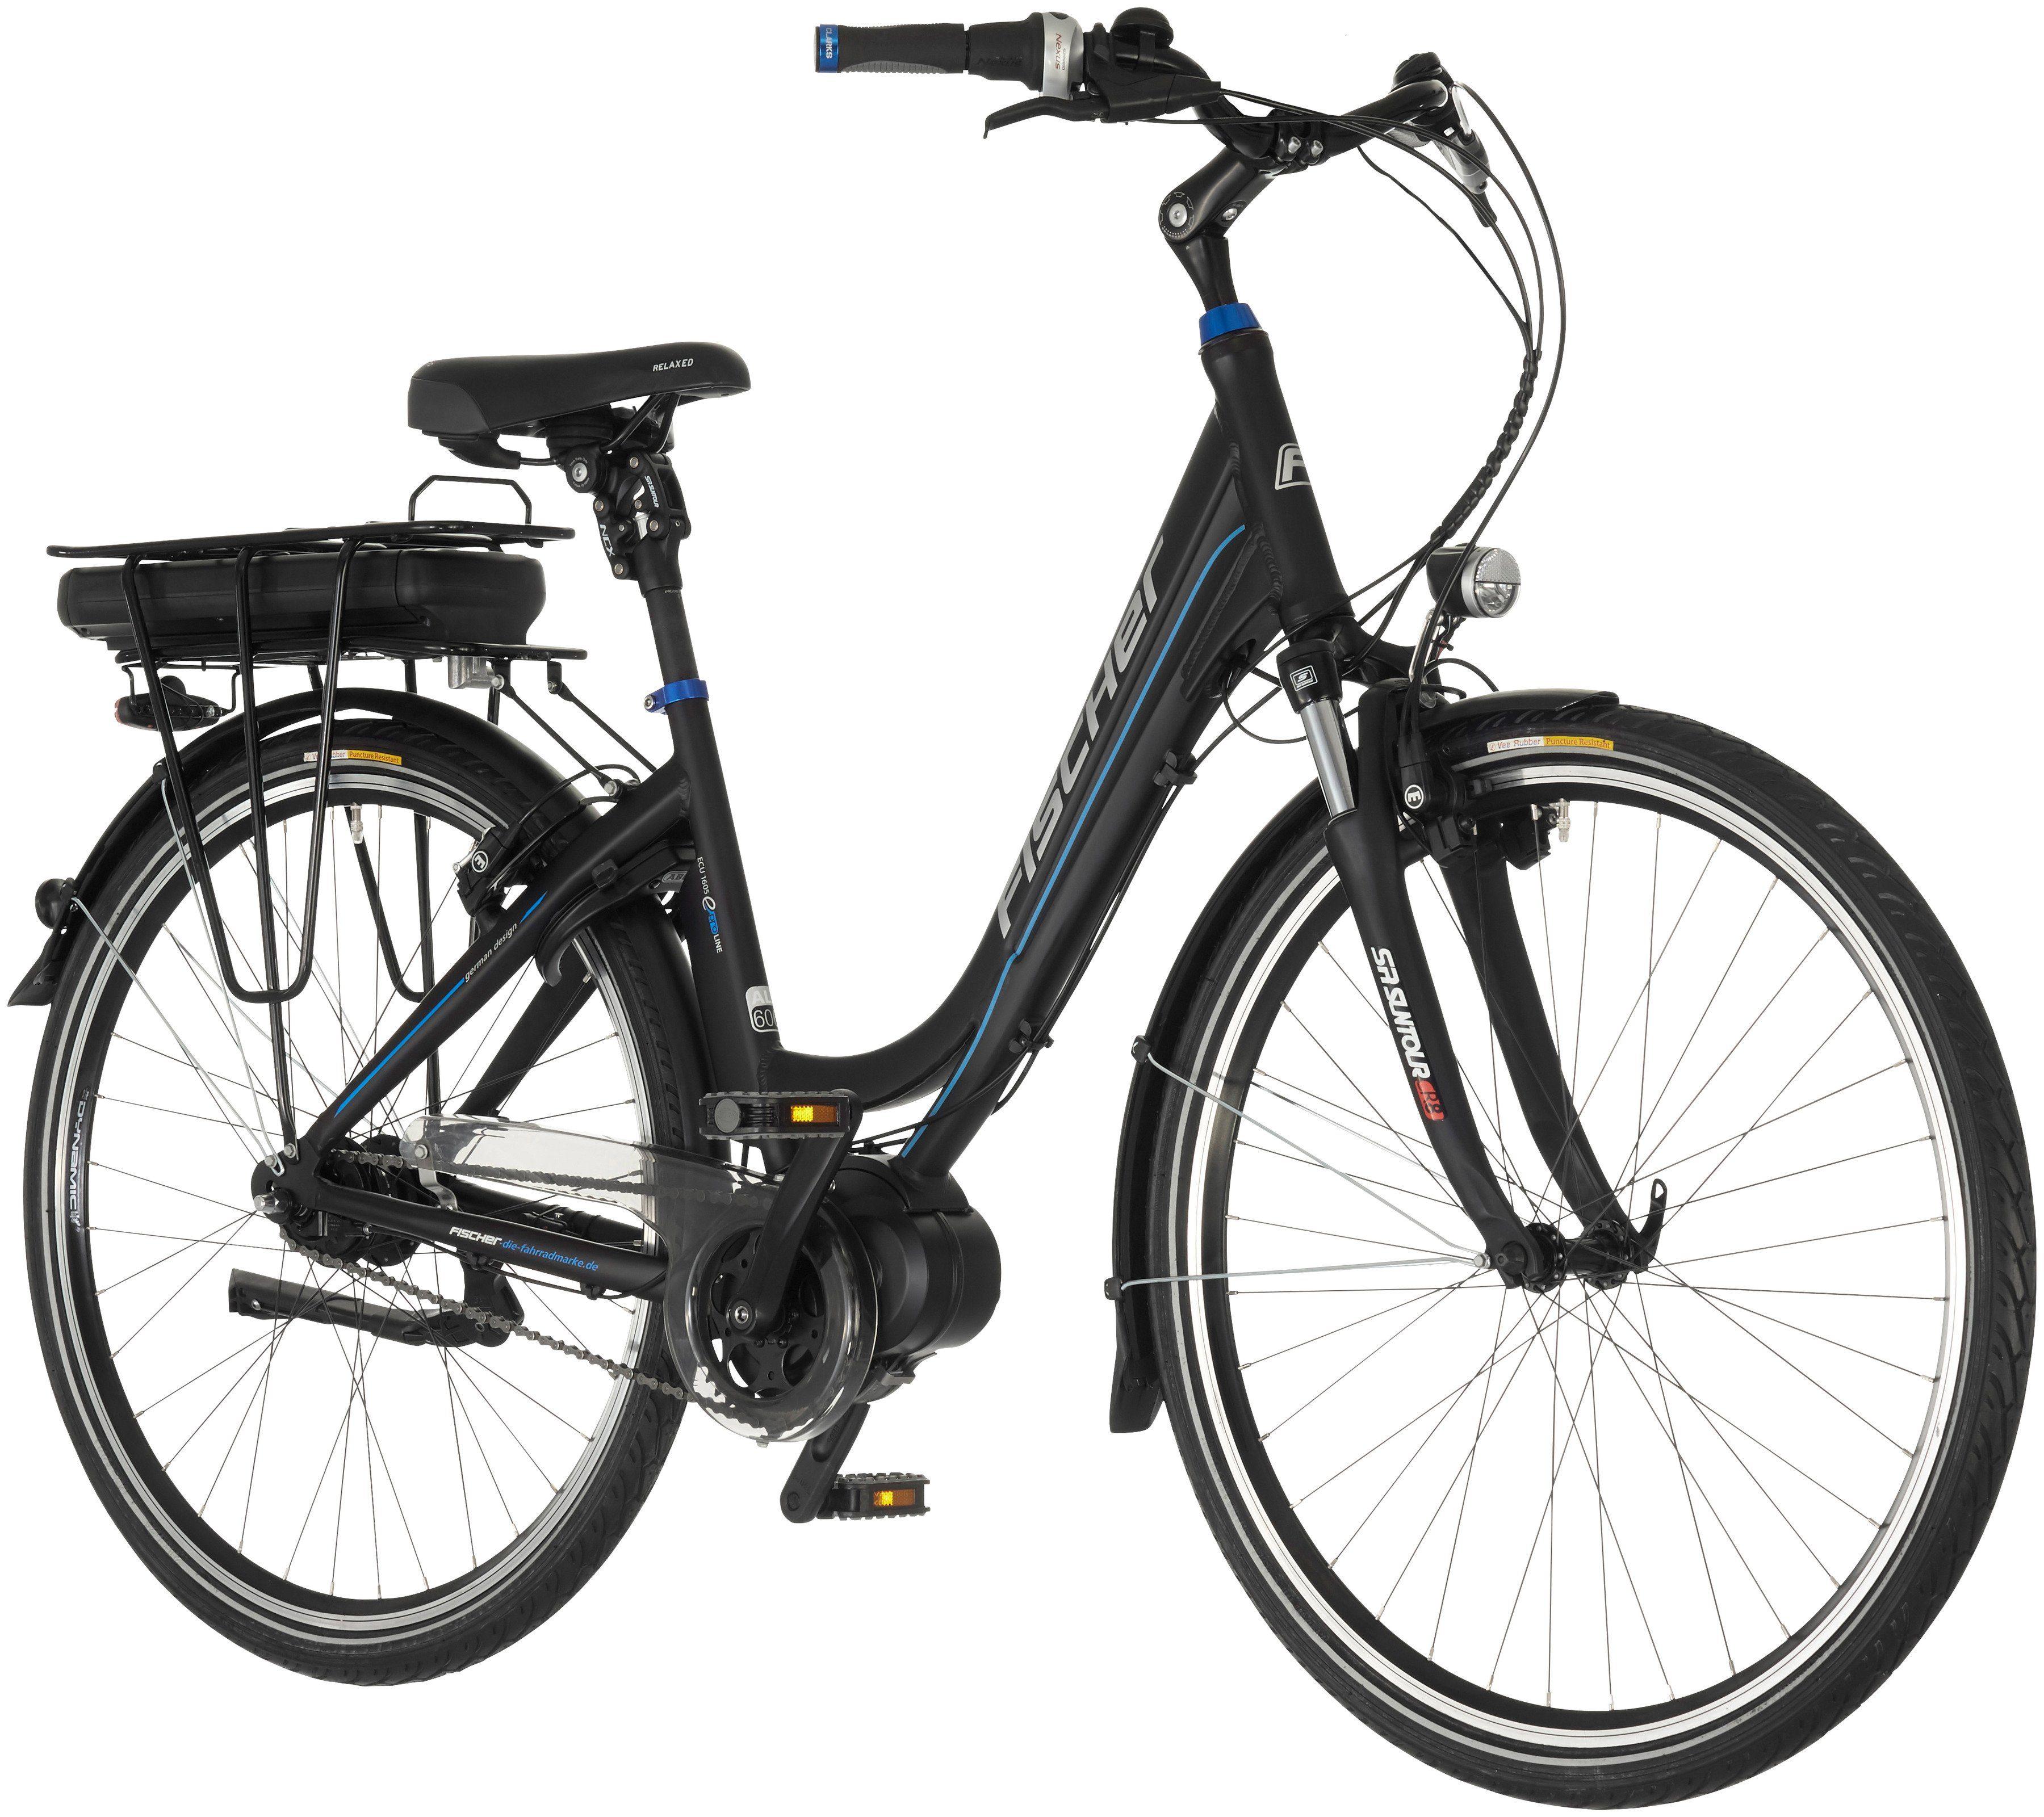 Fischer Fahrraeder E-Bike City Damen »Vitalrad ECU1605«, 28 Zoll, 7 Gang, Mittelmotor, 557 Wh